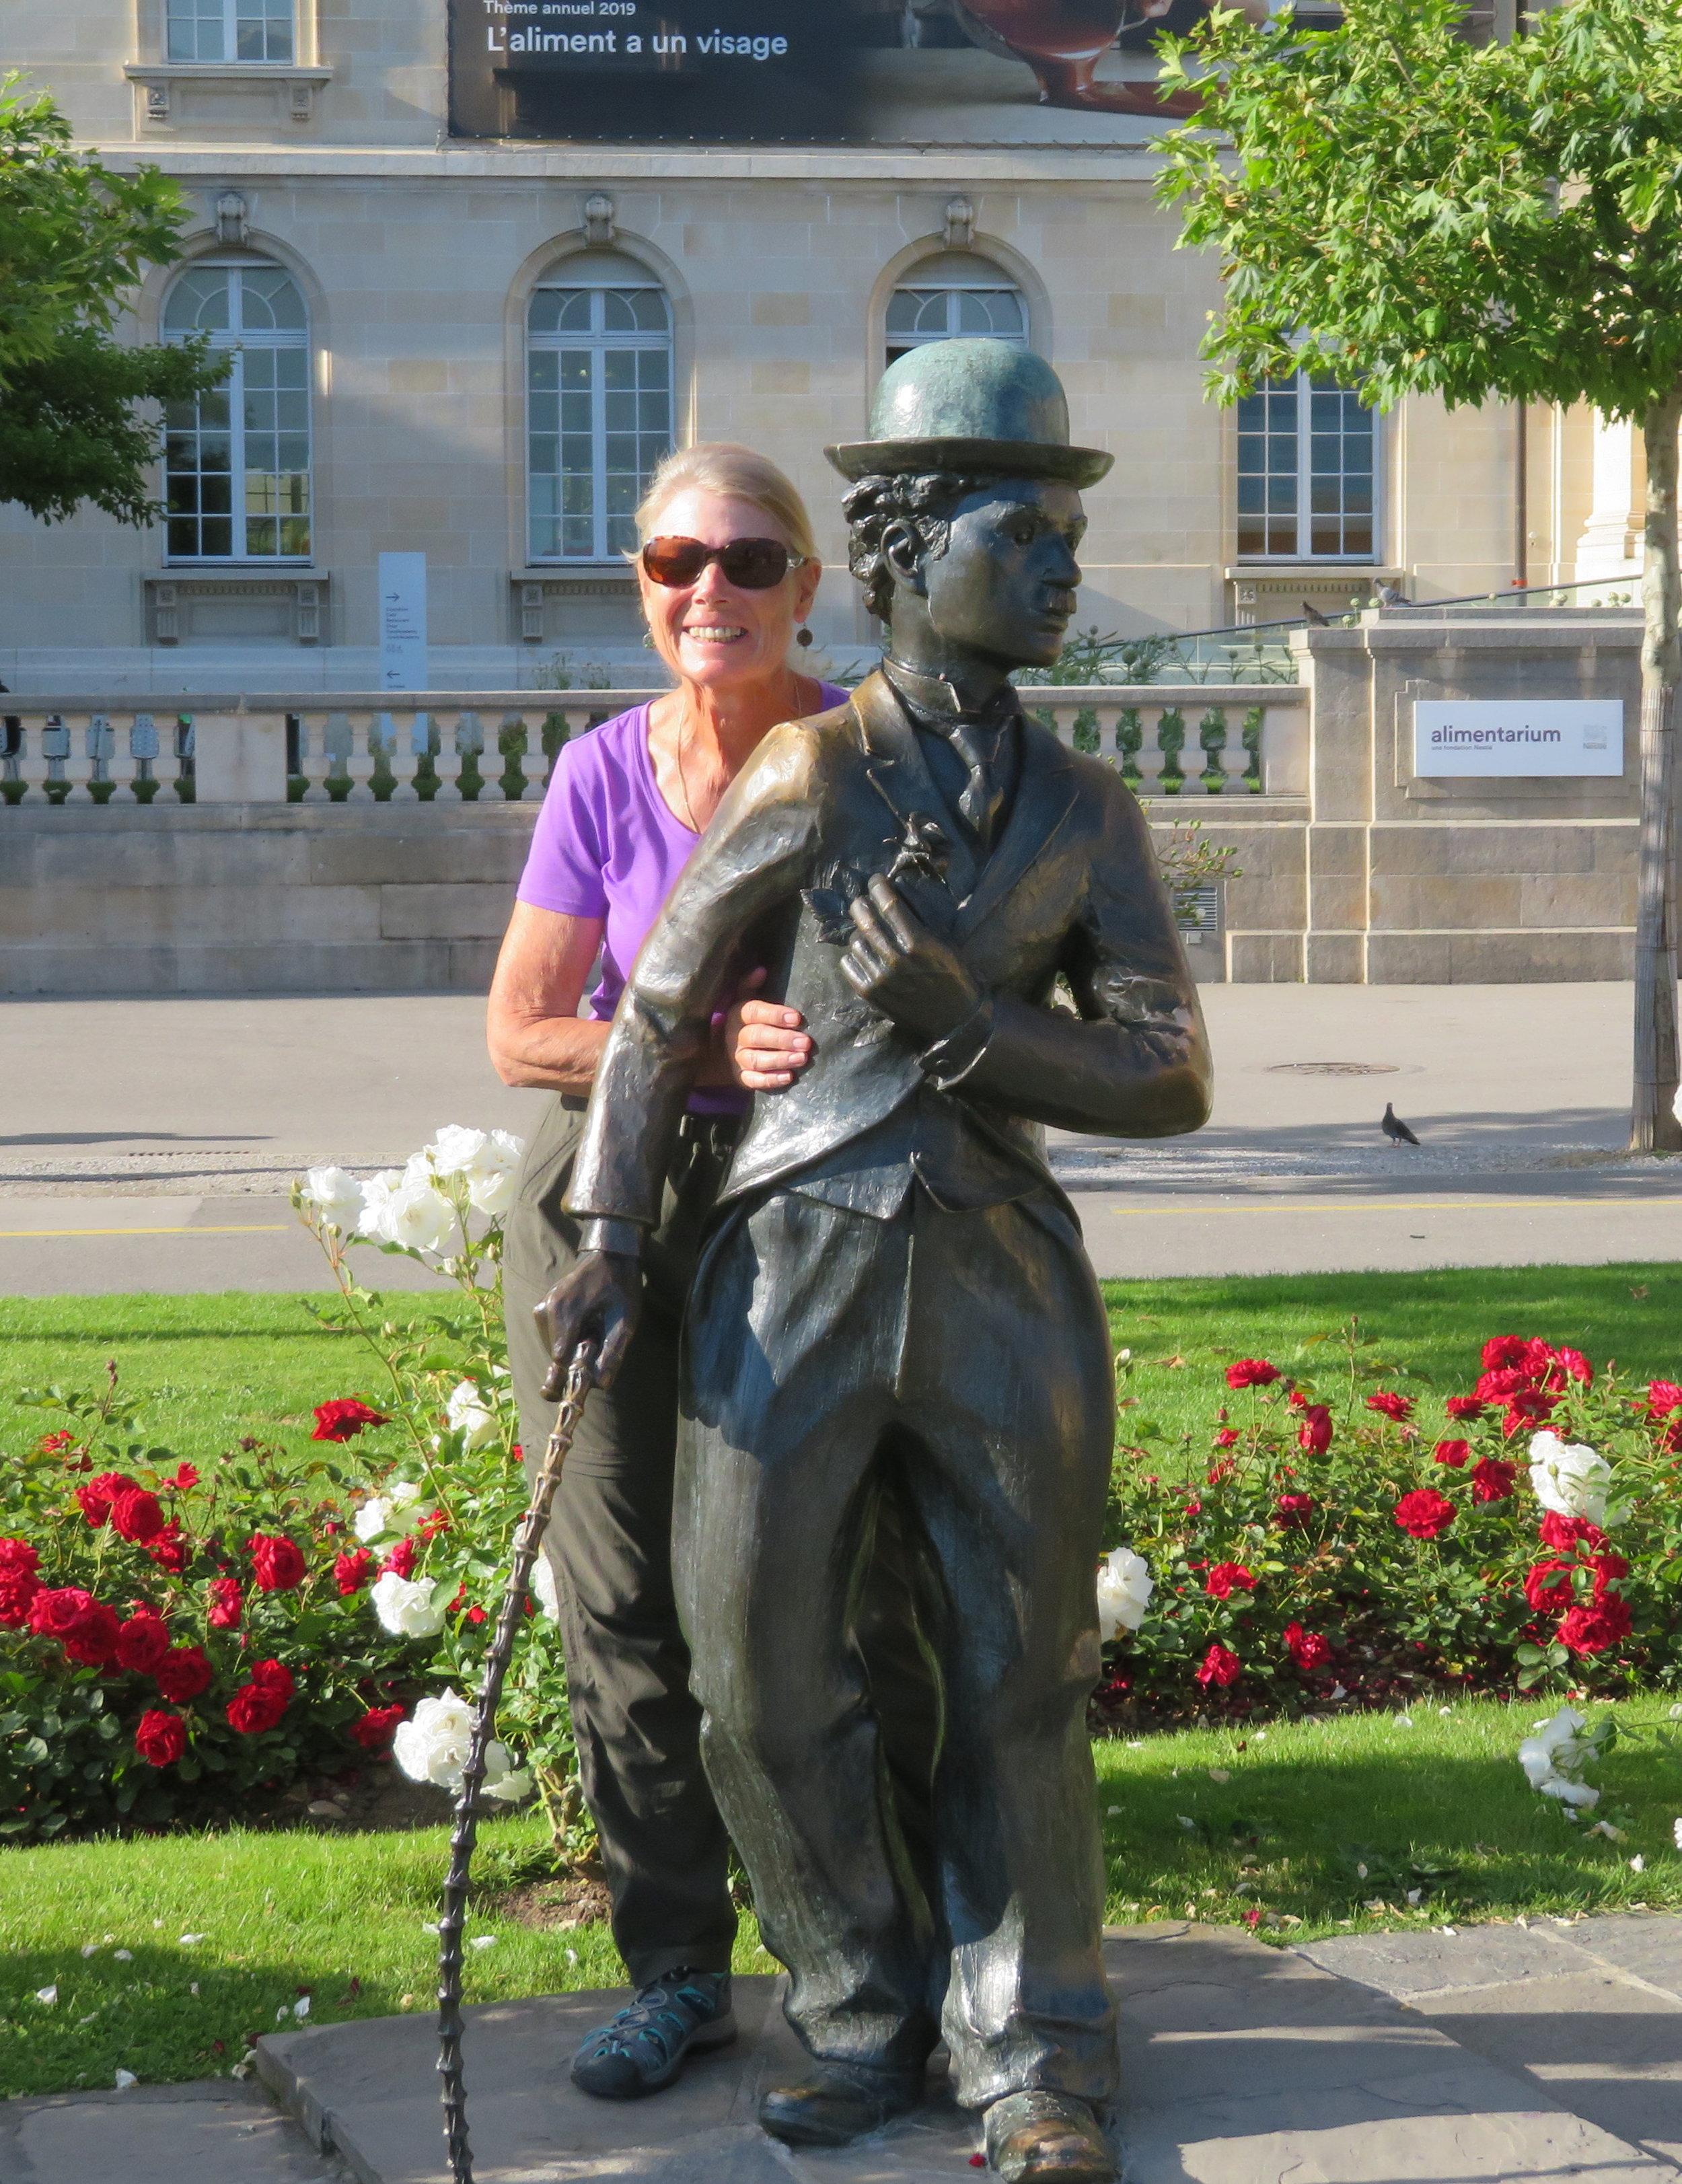 Aigle-Vevey_charlie chaplin statue-mcl.jPG